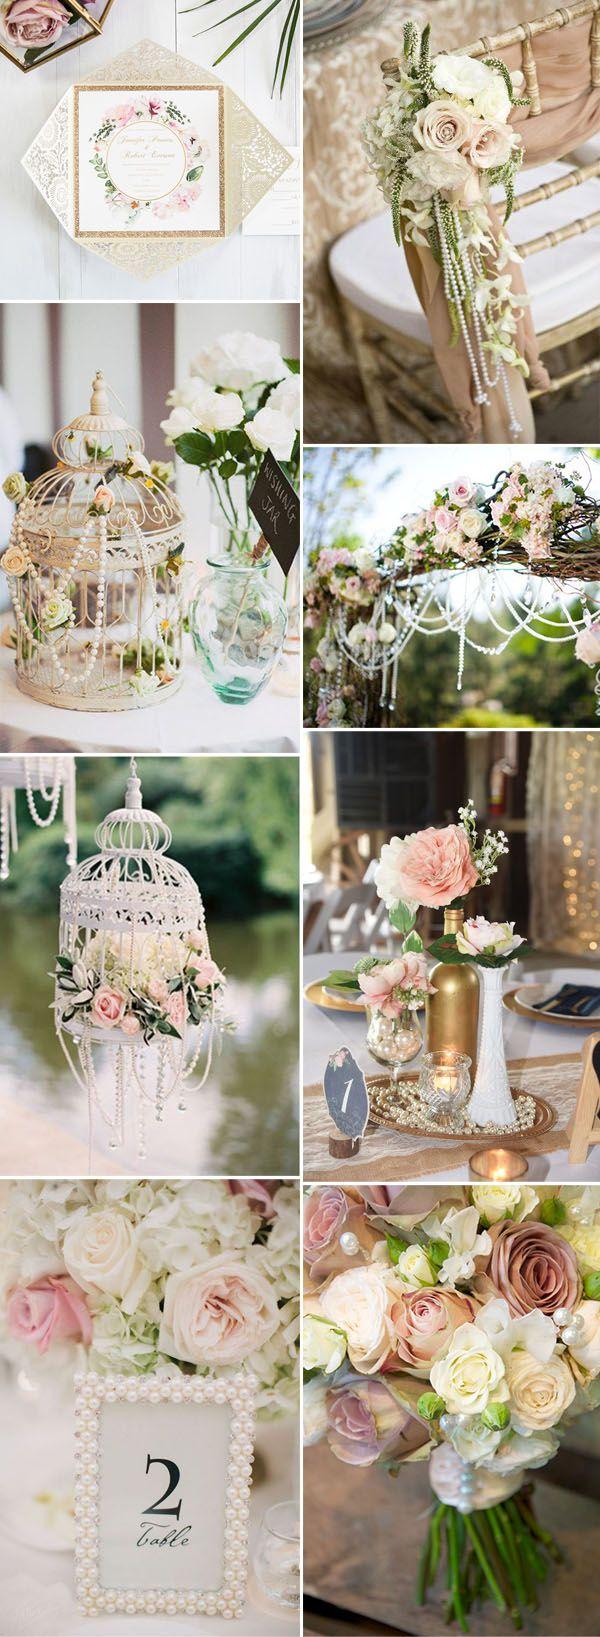 6 Awesome Vintage Wedding Theme Ideas to Inspire You -  Elegantweddinginvites.com Blog | Vintage wedding theme, Vintage wedding  reception, Vintage wedding romantic